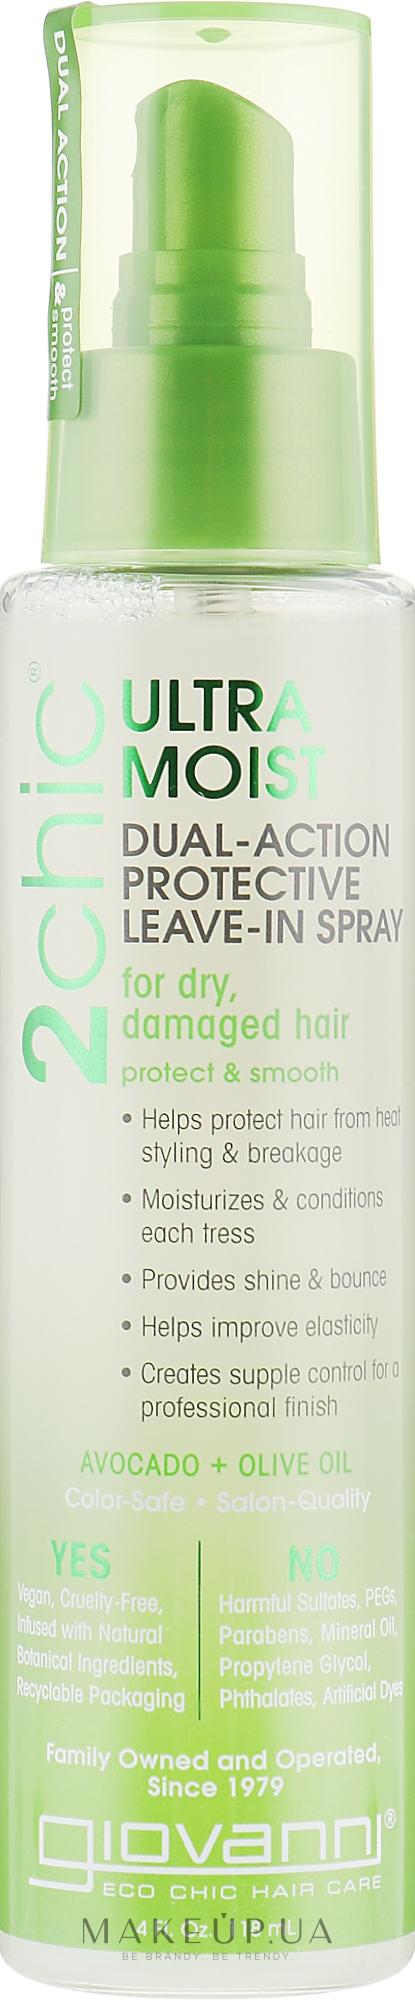 Зволожуючий спрей для волосся - Giovanni 2chic Ultra-Moist Dual Action Protective Leave-In Spray Avocado & Olive Oil — фото 118ml